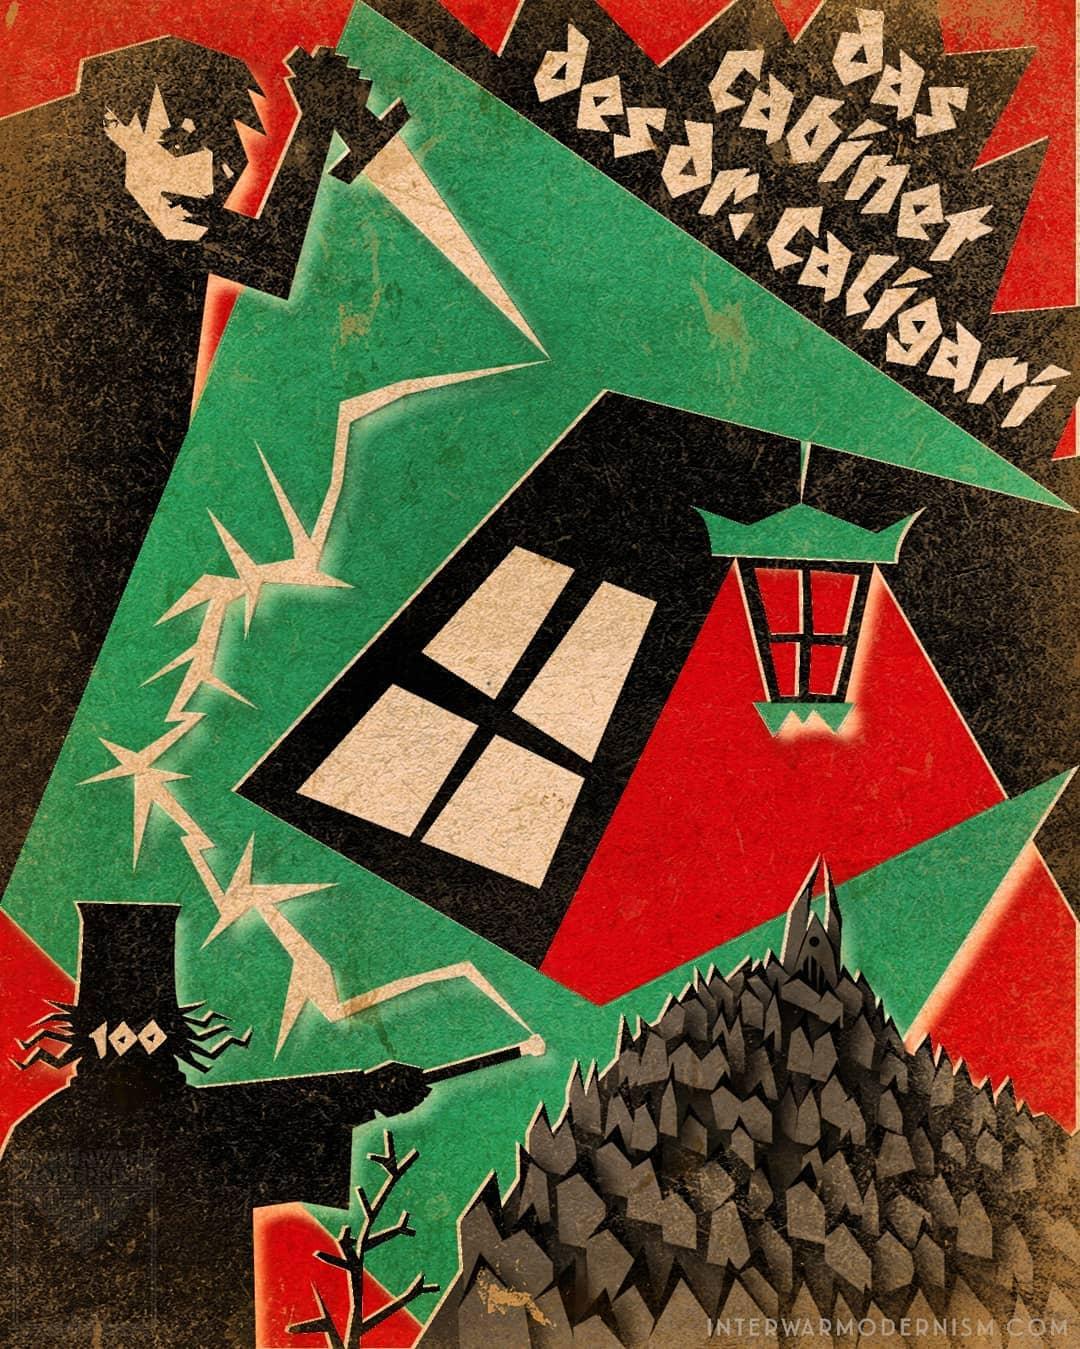 cinema/das-cabinet-des-dr-caligari-1920.jpg